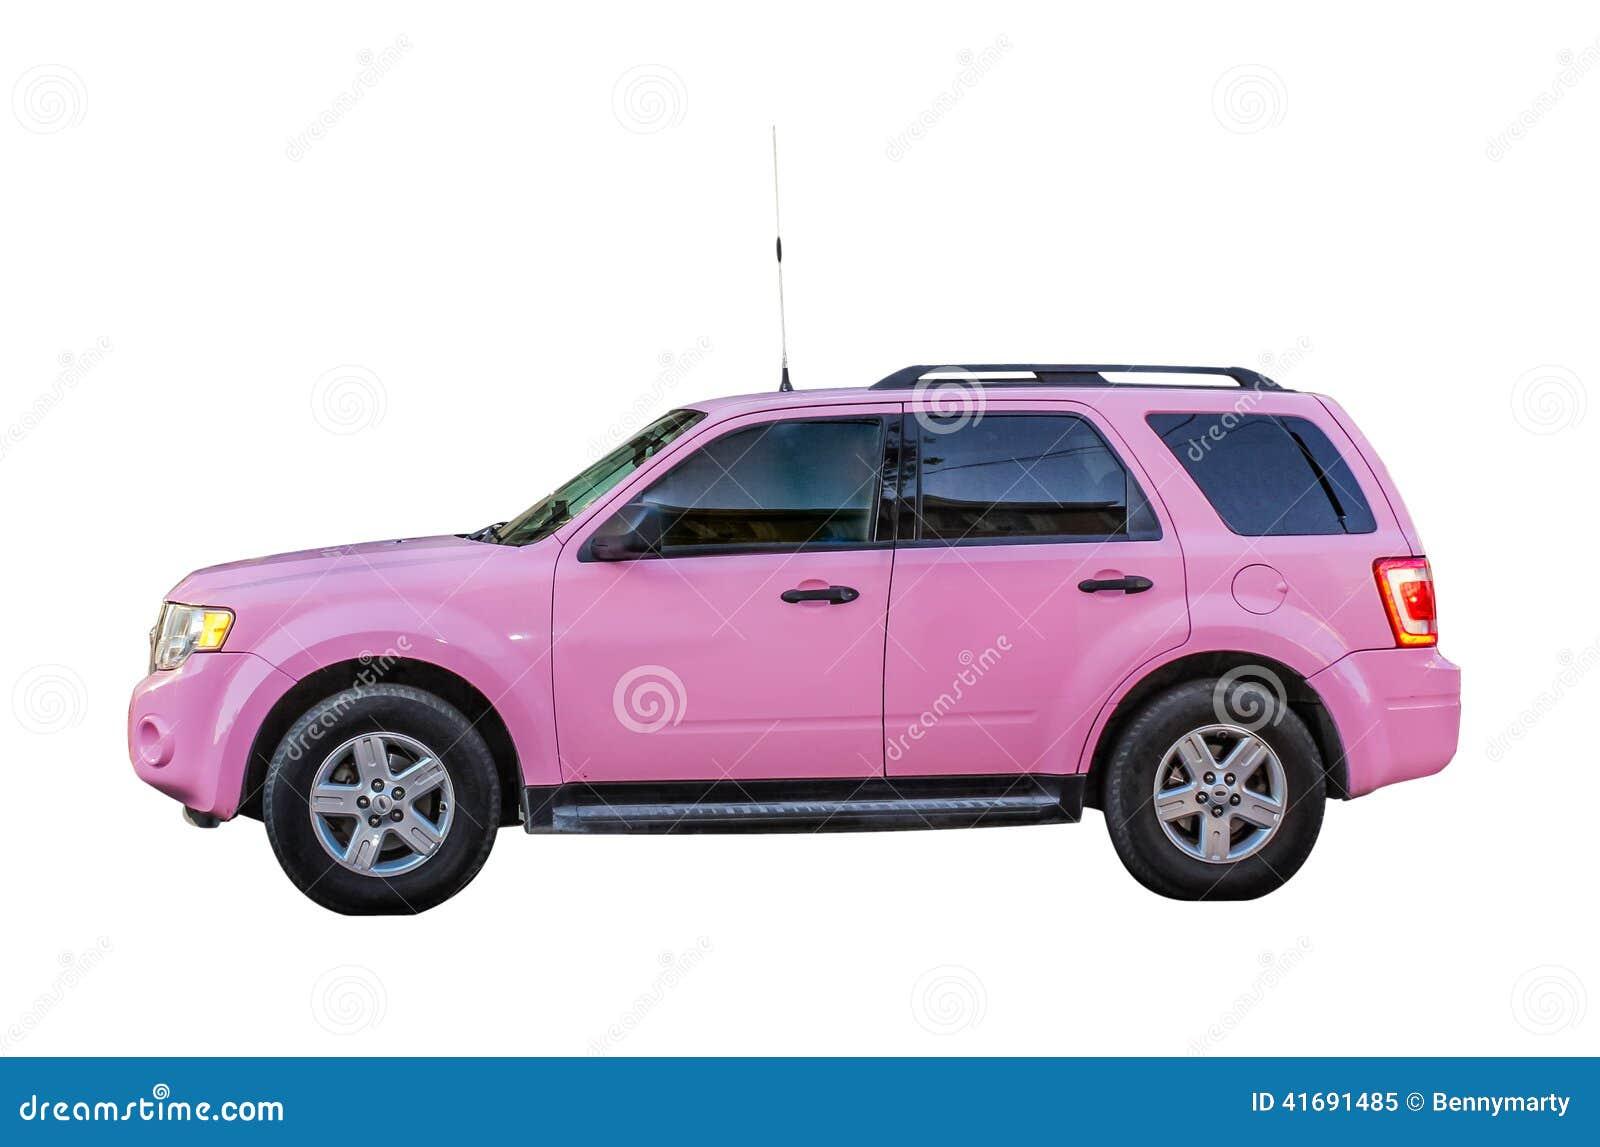 Range Rover Vector >> Pink SUV Stock Photo - Image: 41691485